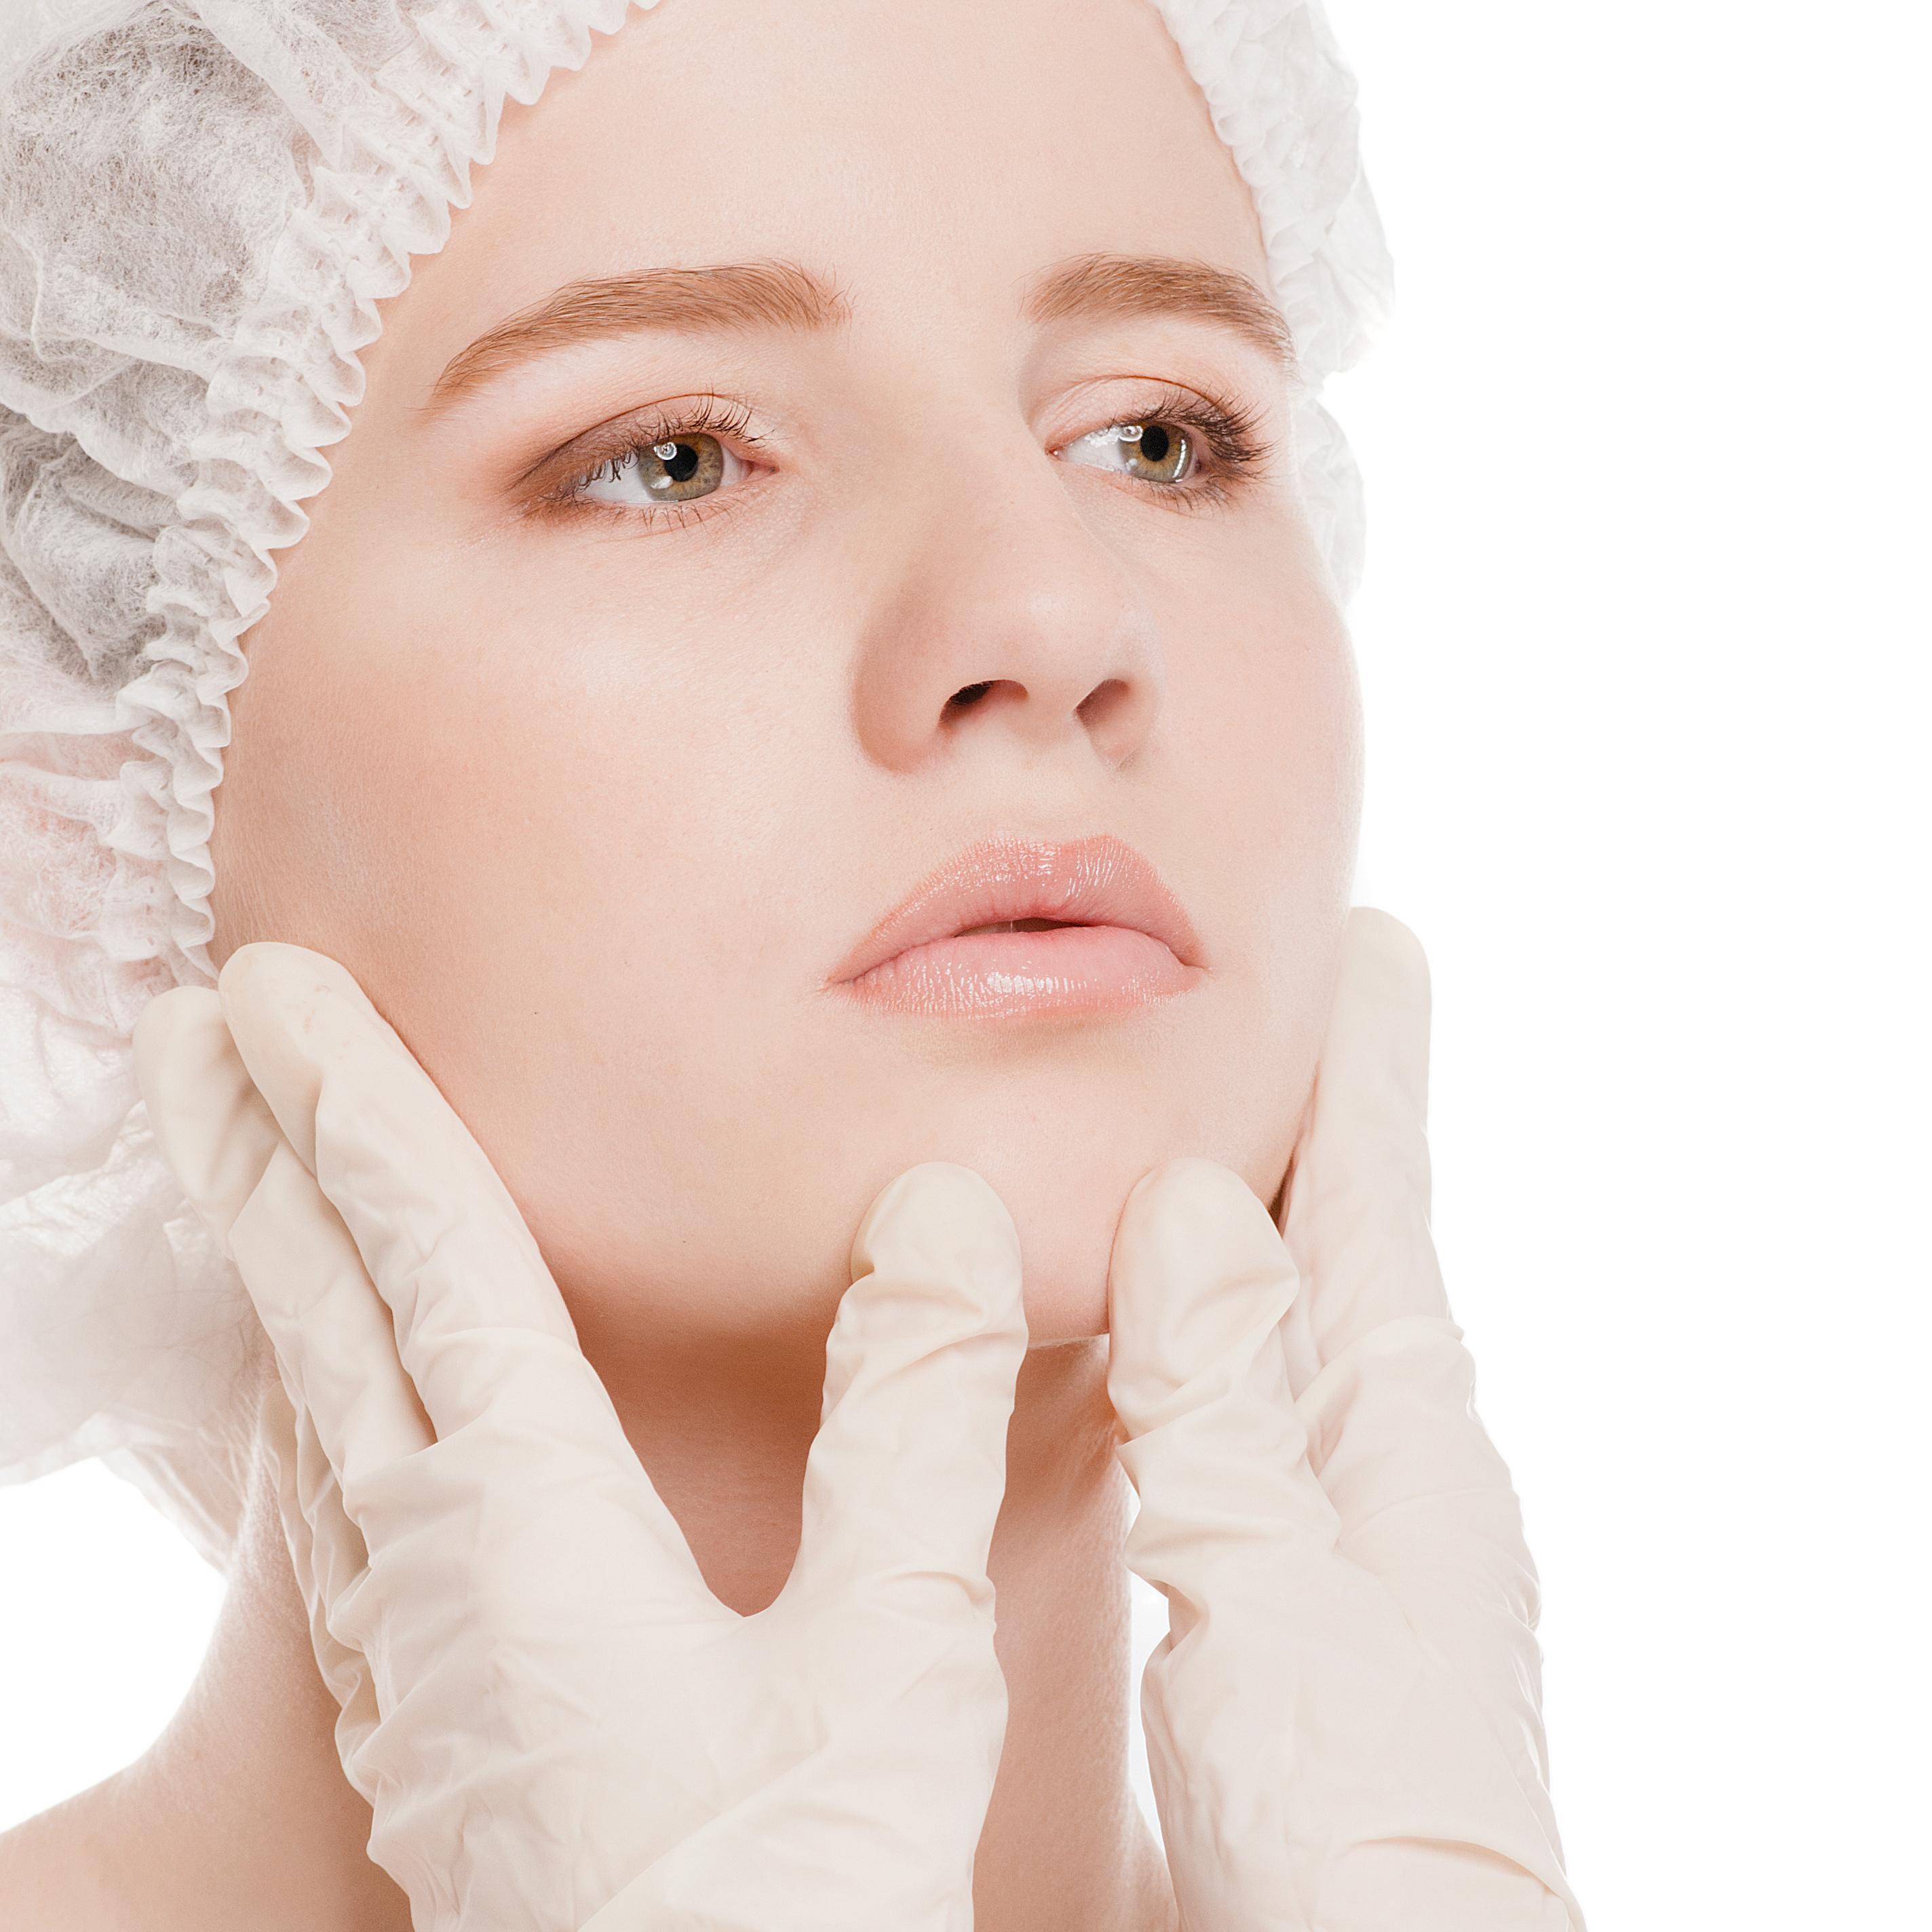 dermatology skin exam